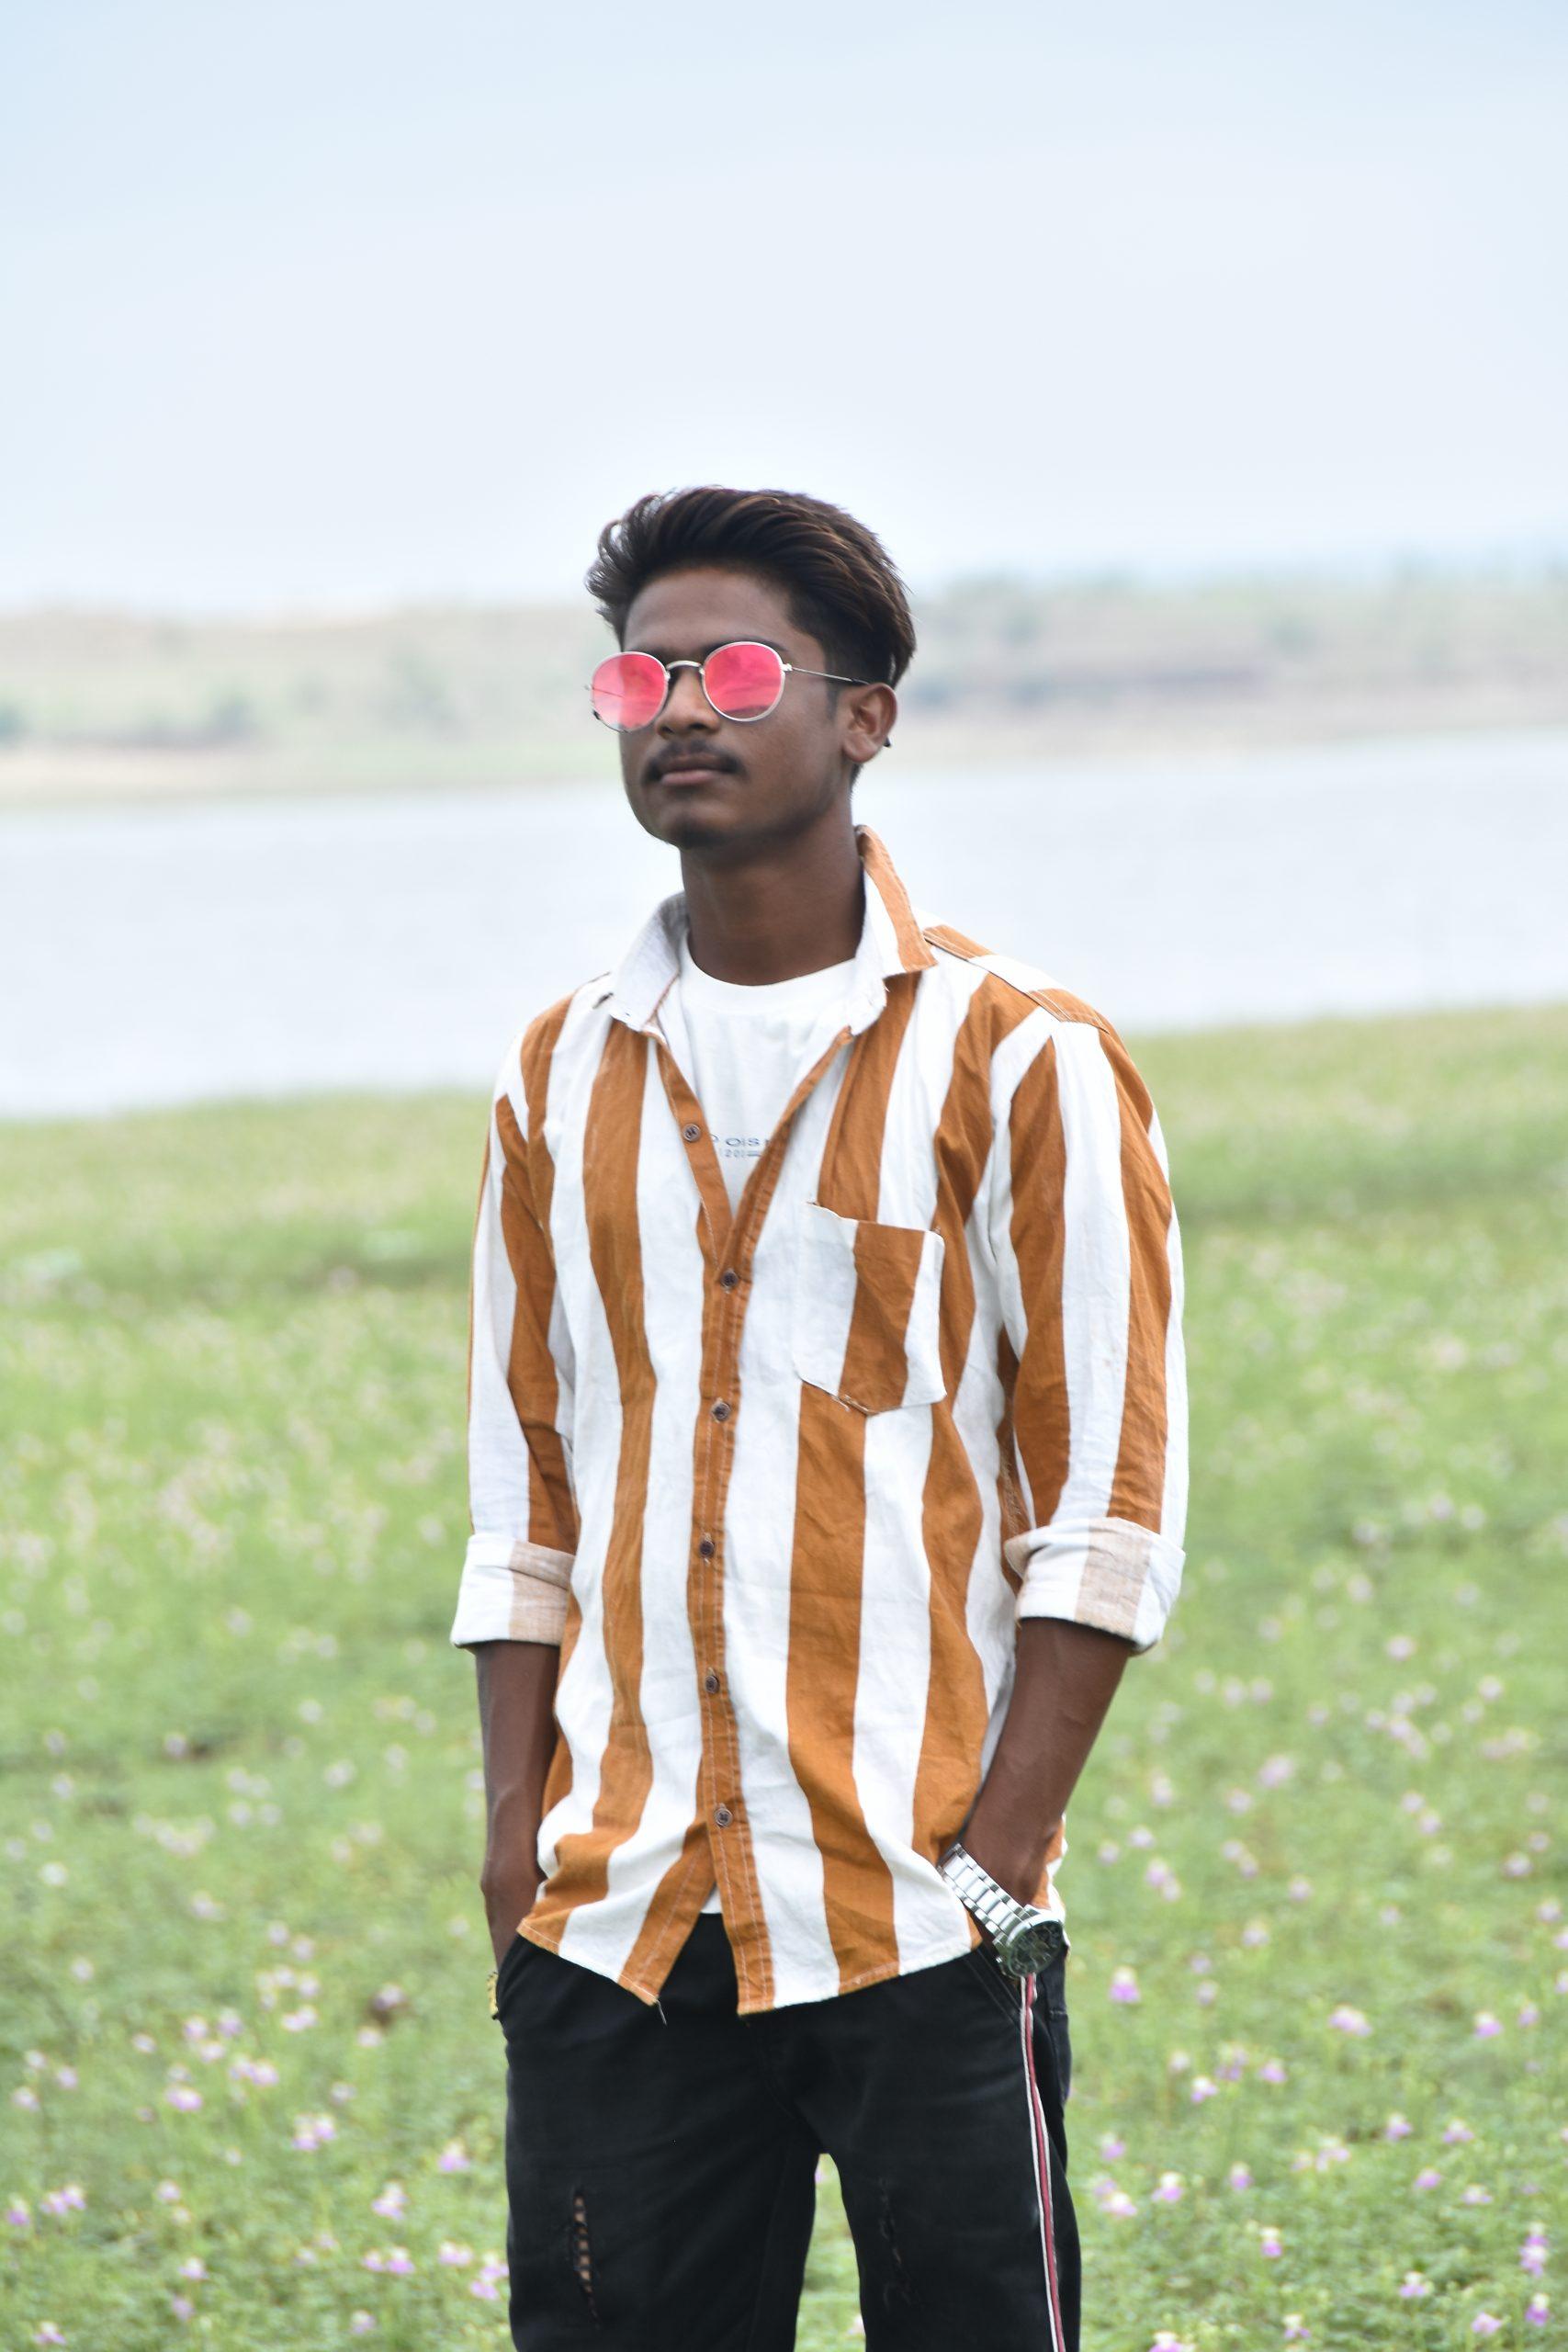 Stylish boy posing in the farm with sunglasses